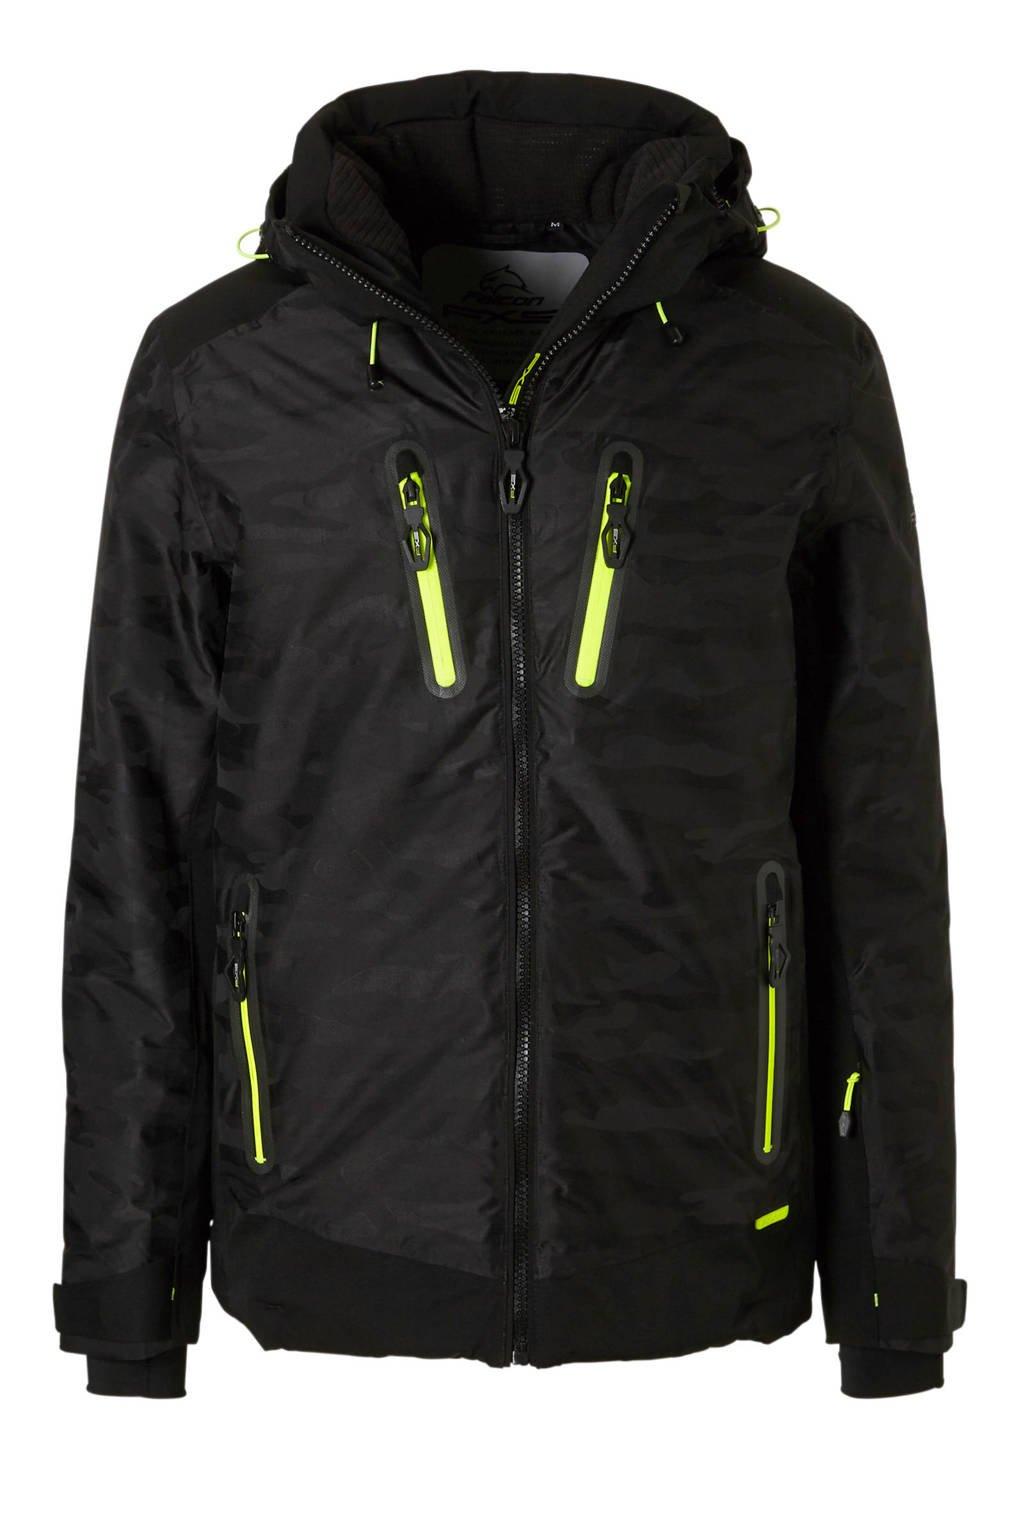 Falcon ski-jack Rock zwart, Zwart/neon geel